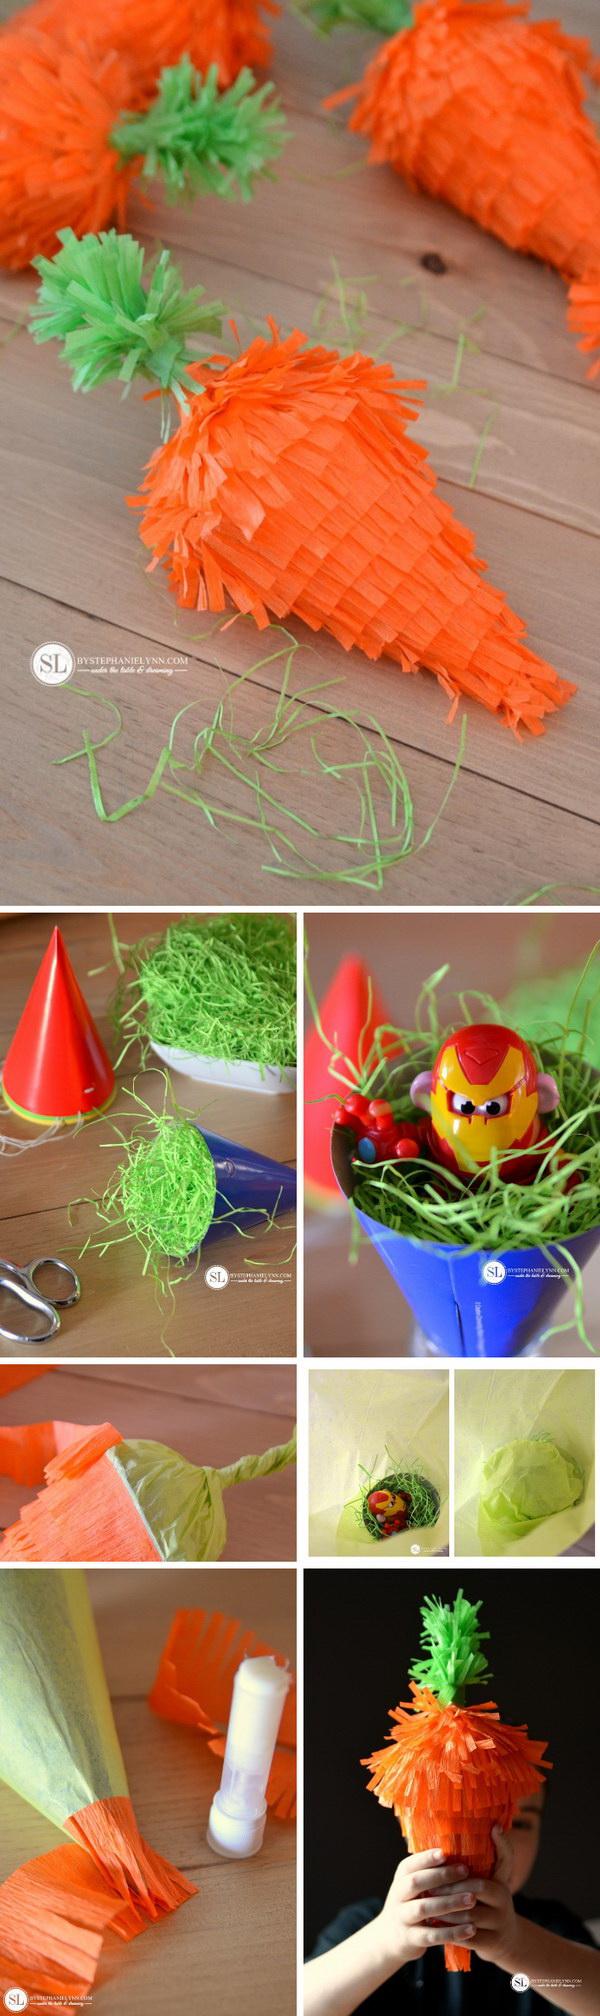 DIY Easter Decoration Ideas: DIY Mini Easter Carrot Pinatas.